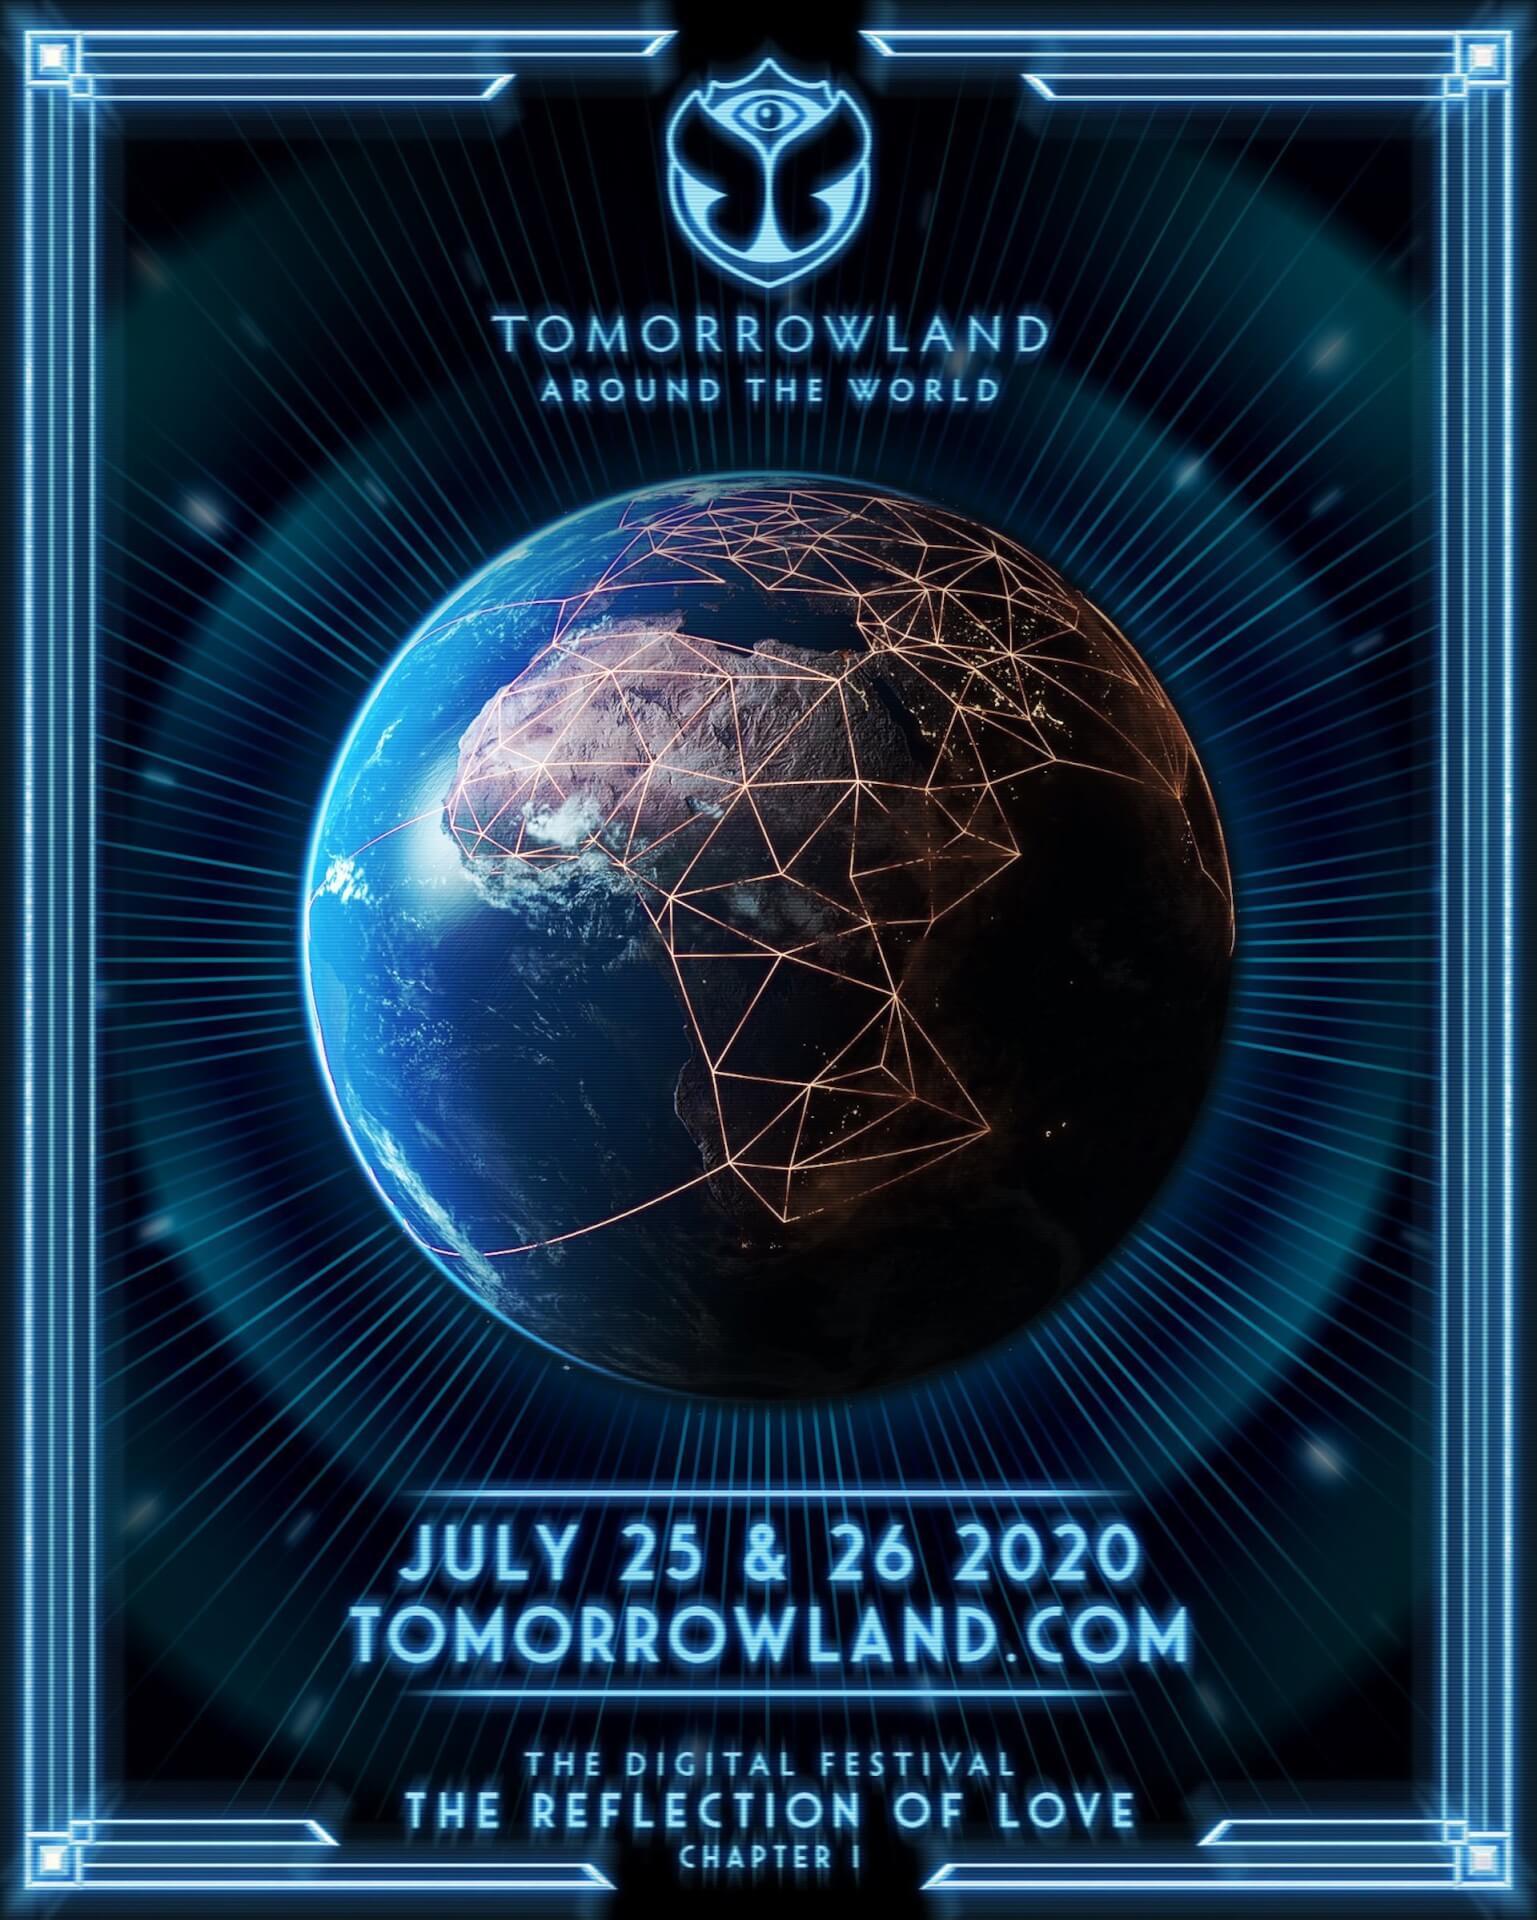 Martin Garrix、Amelie Lensら出演<Tomorrowland>デジタルフェスのチケットが発売中!日本公式HPも公開 music200605_tomorrowland_02